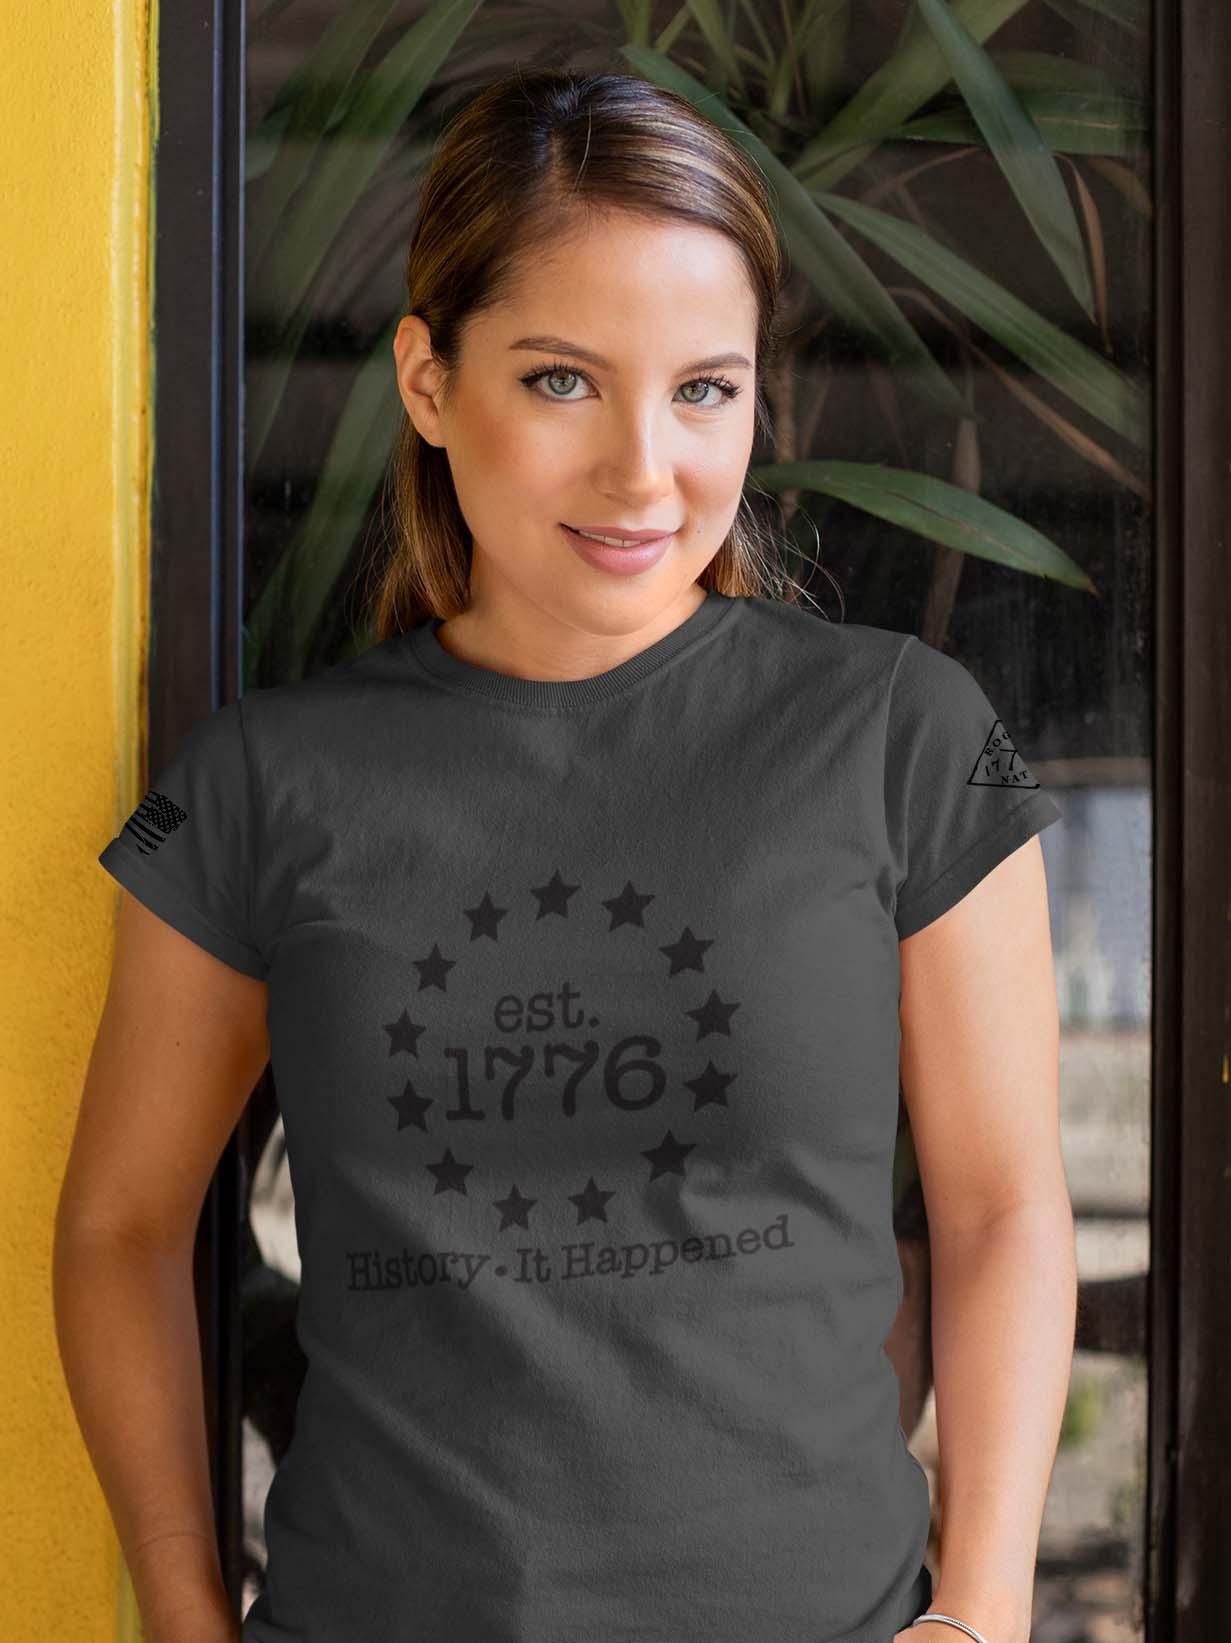 t-shirt history it happened charcoal women's